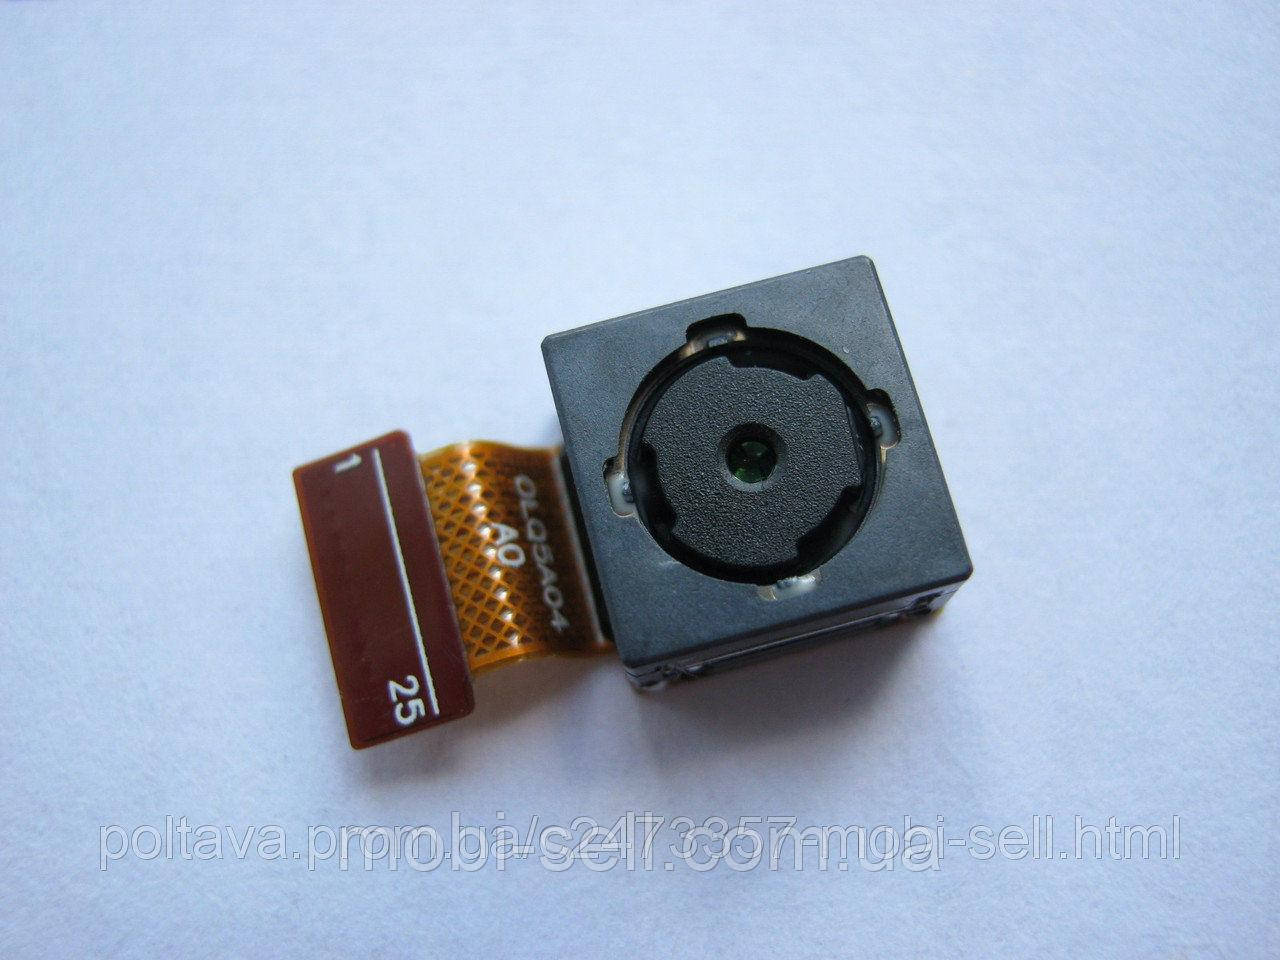 Prestigio PAP5400 DUO камера OLQ5A04 основная тыловая (оригинал, разборка)